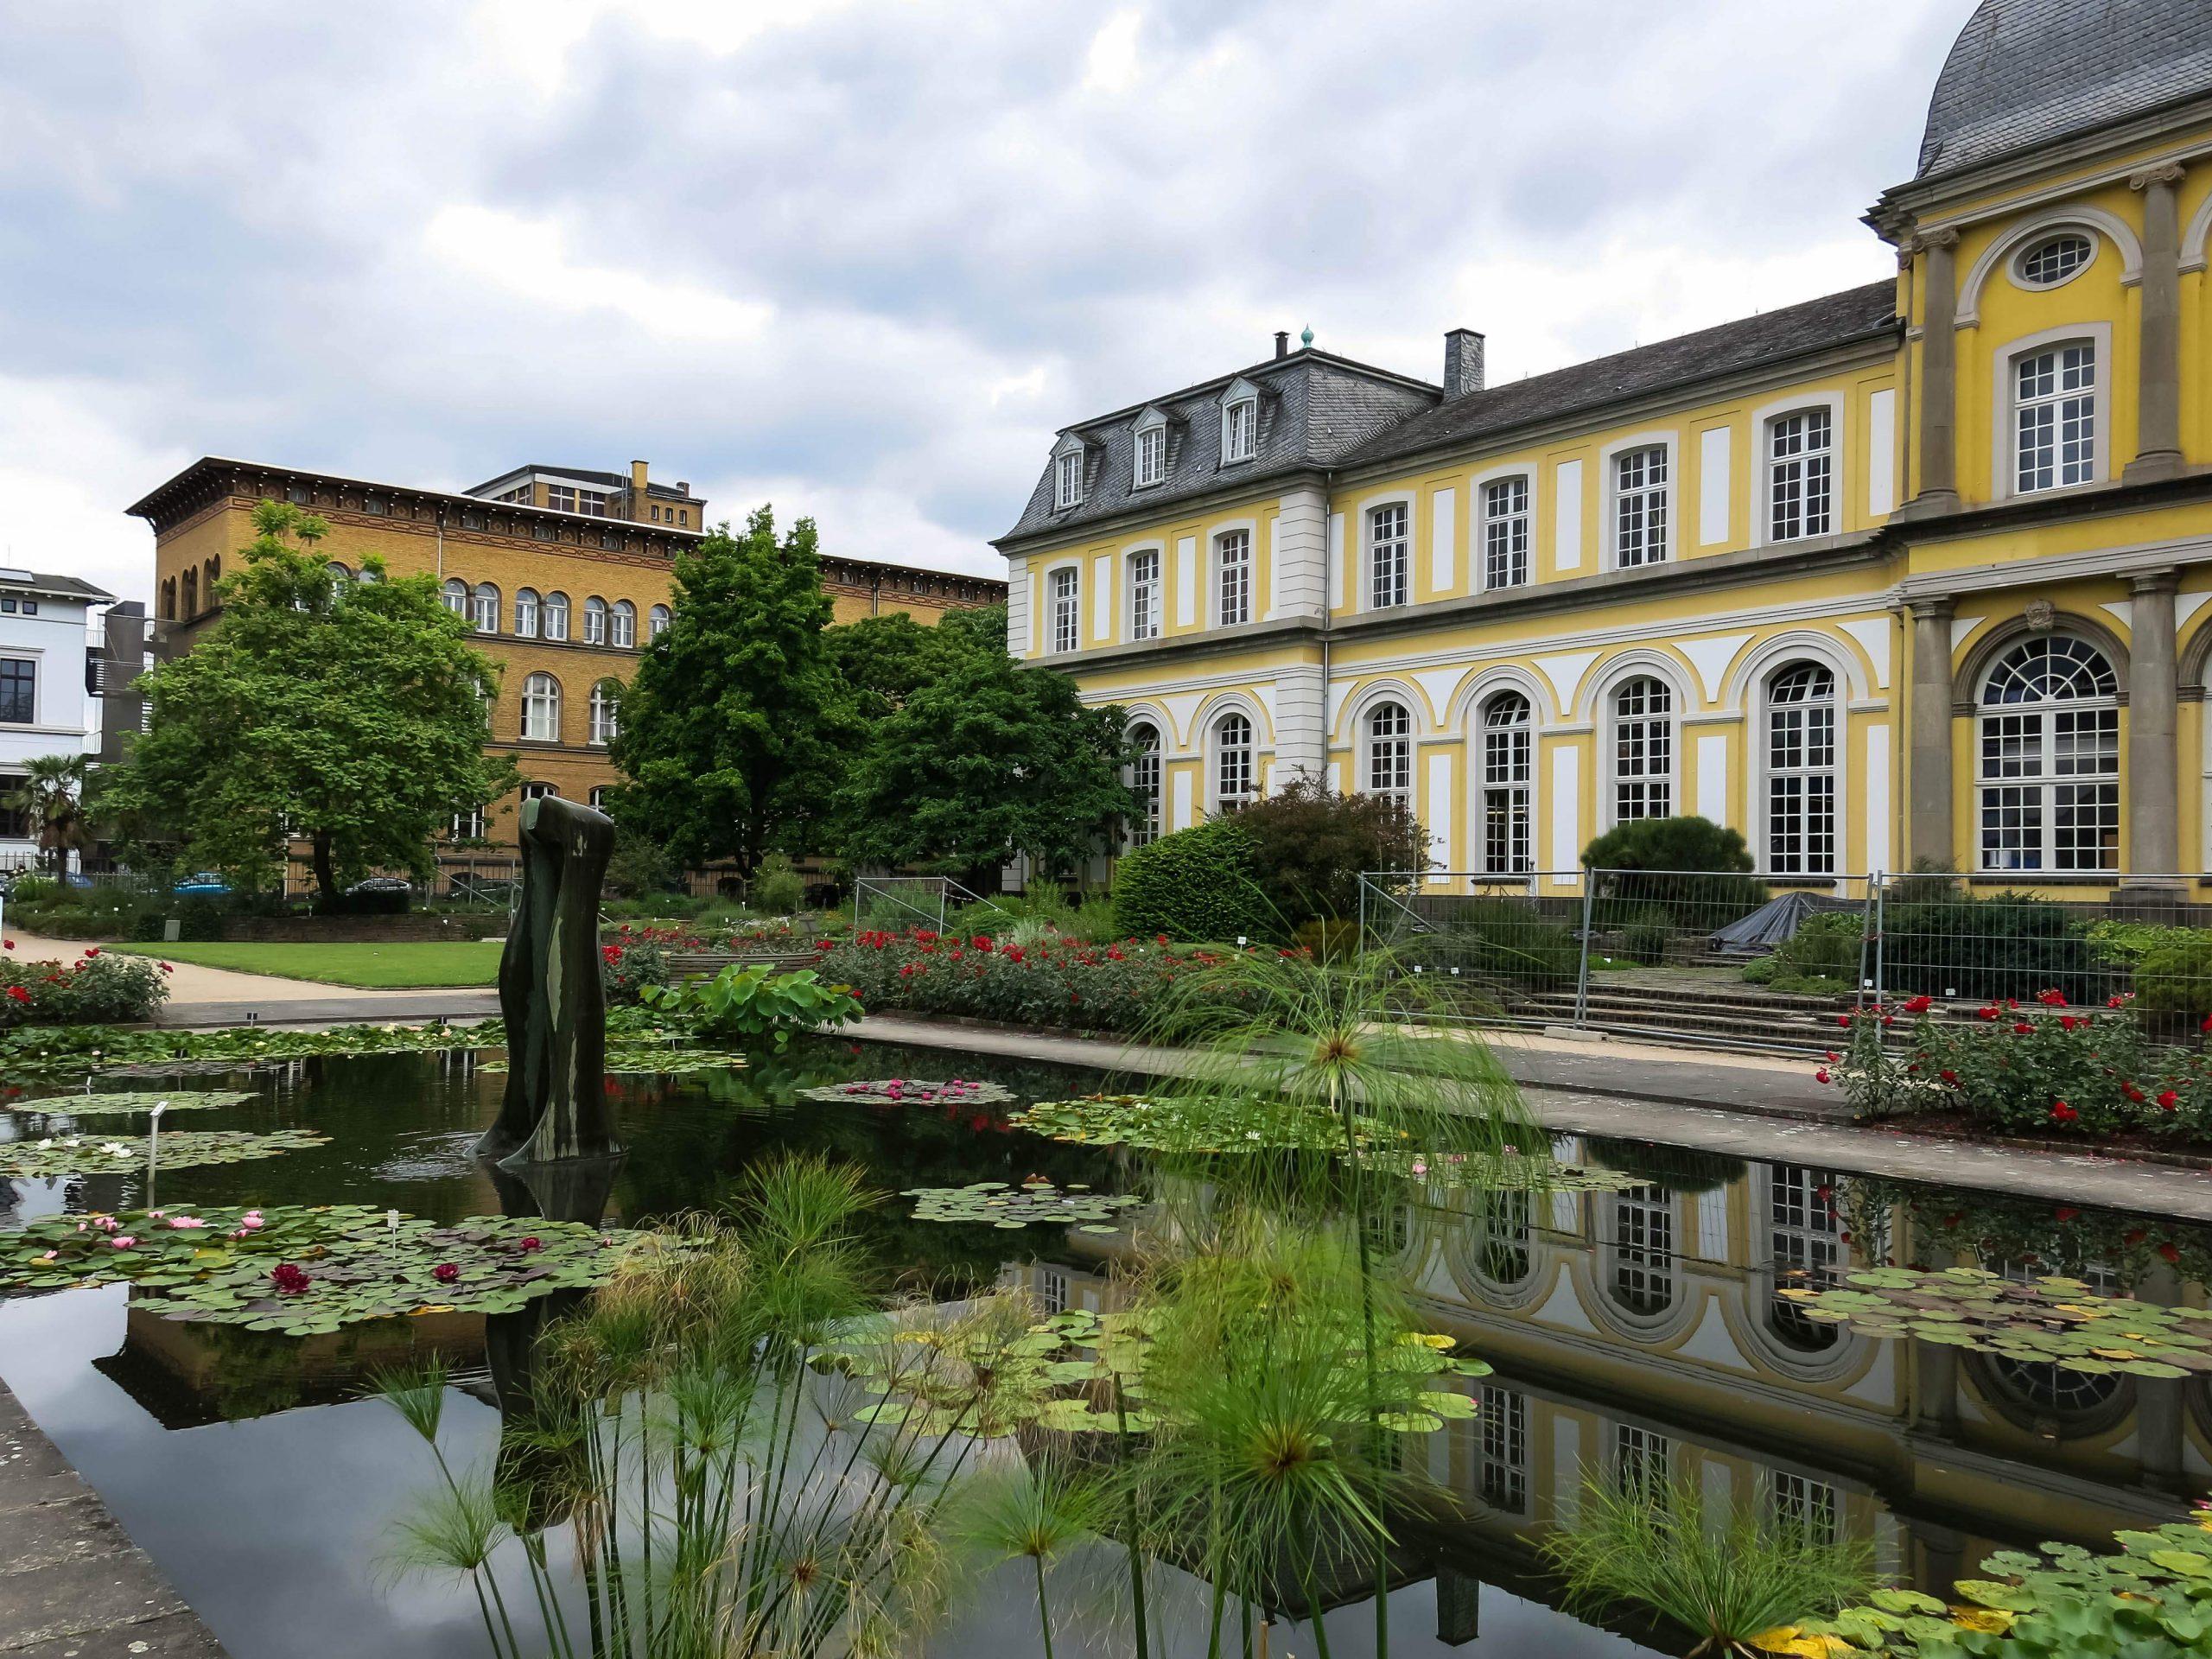 Datei 2018 06 18 bonn meckenheimer allee 169 botanischer garten lyrabrunnen 06